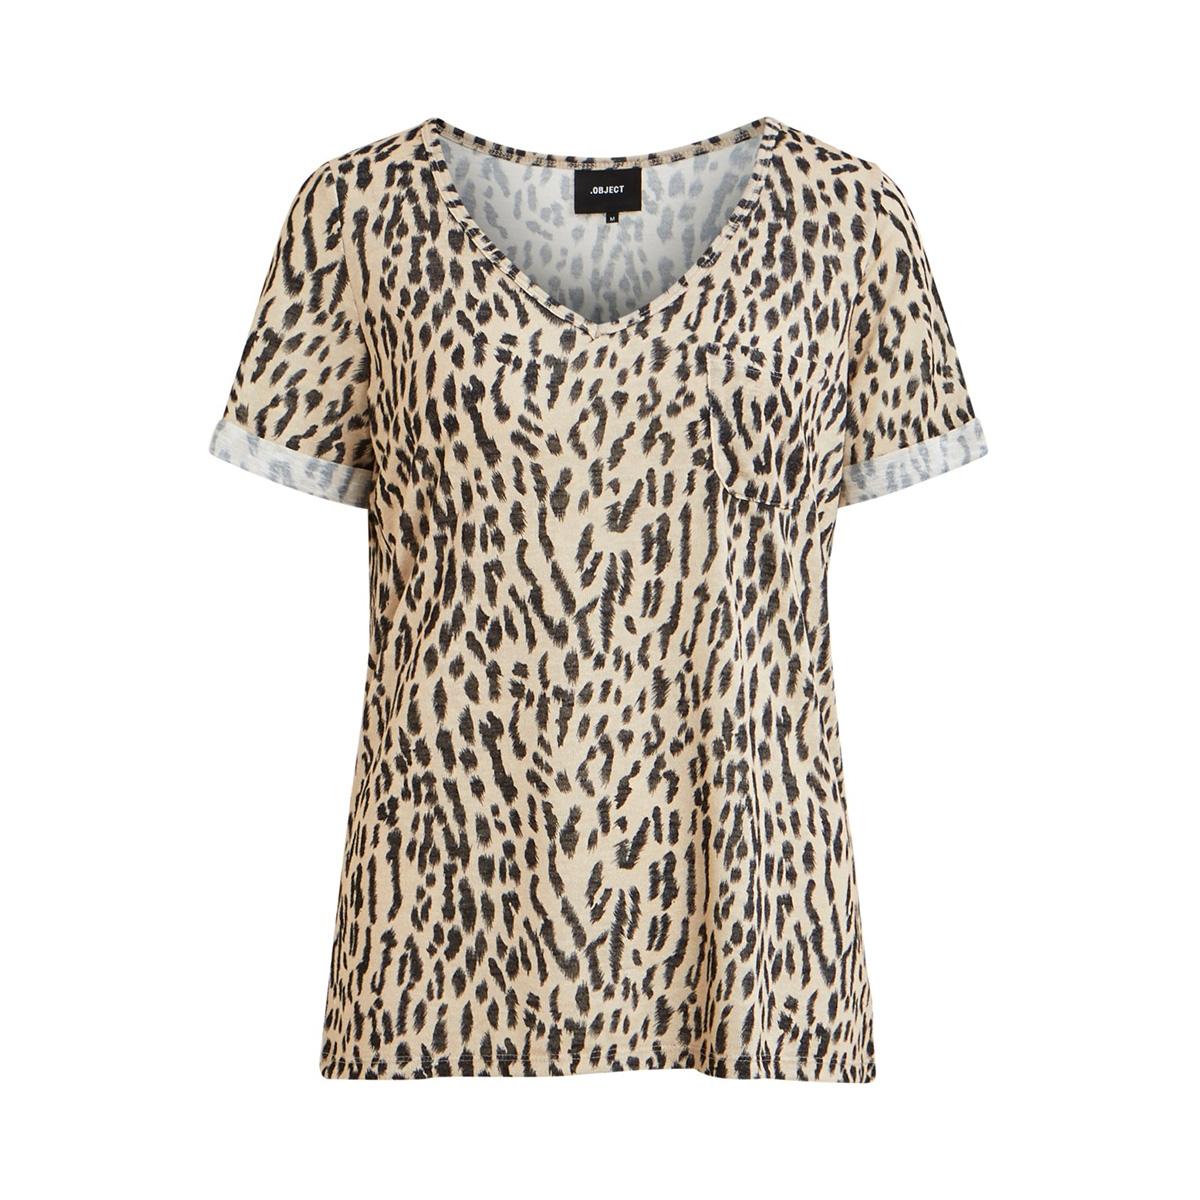 objtessi slub s/s v-neck aop season 23029730 object t-shirt humus/animal